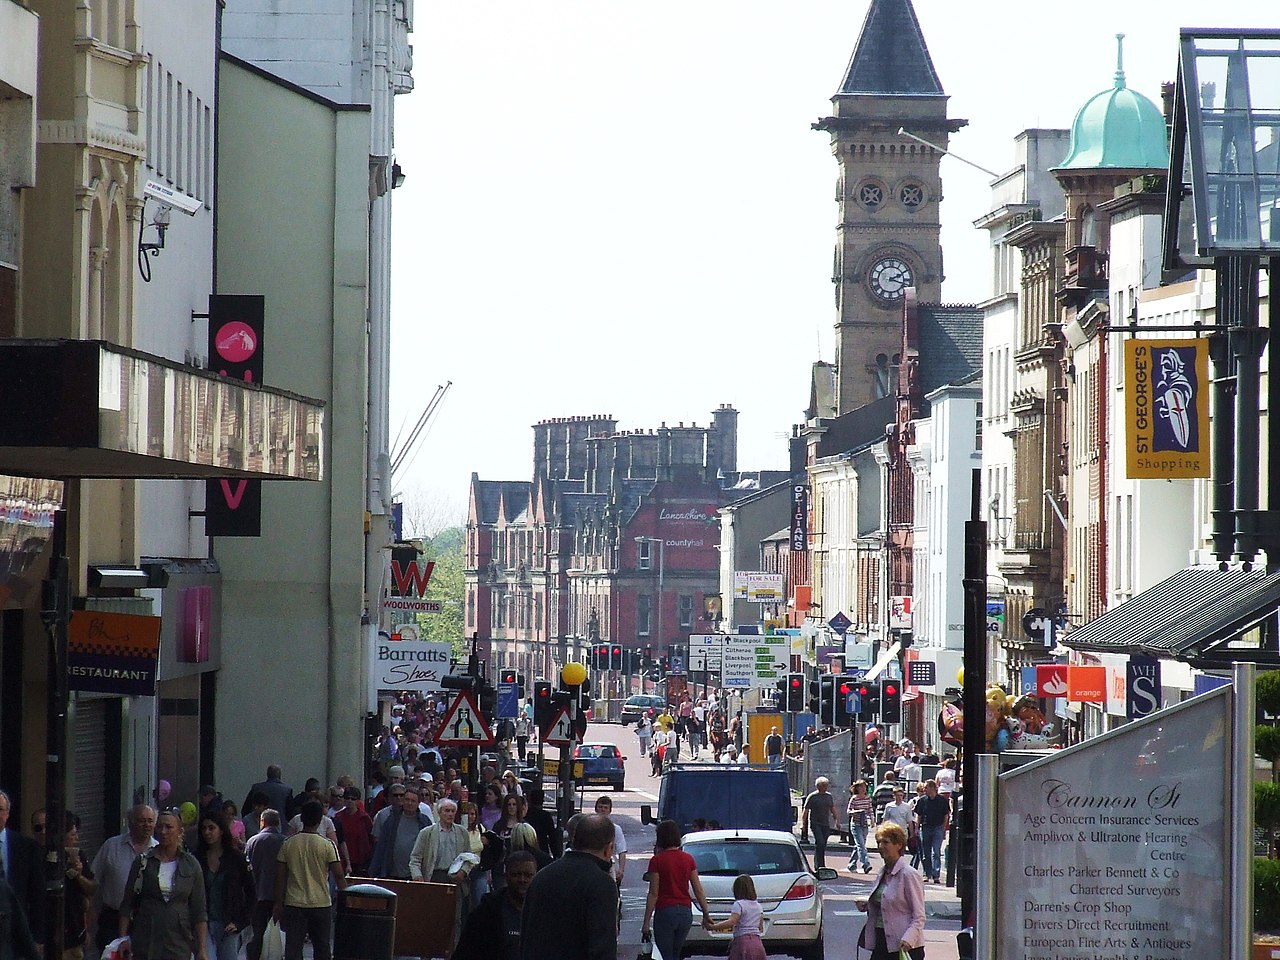 Wikipedia (https://en.wikipedia.org/wiki/Preston,_Lancashire#Major_employers)